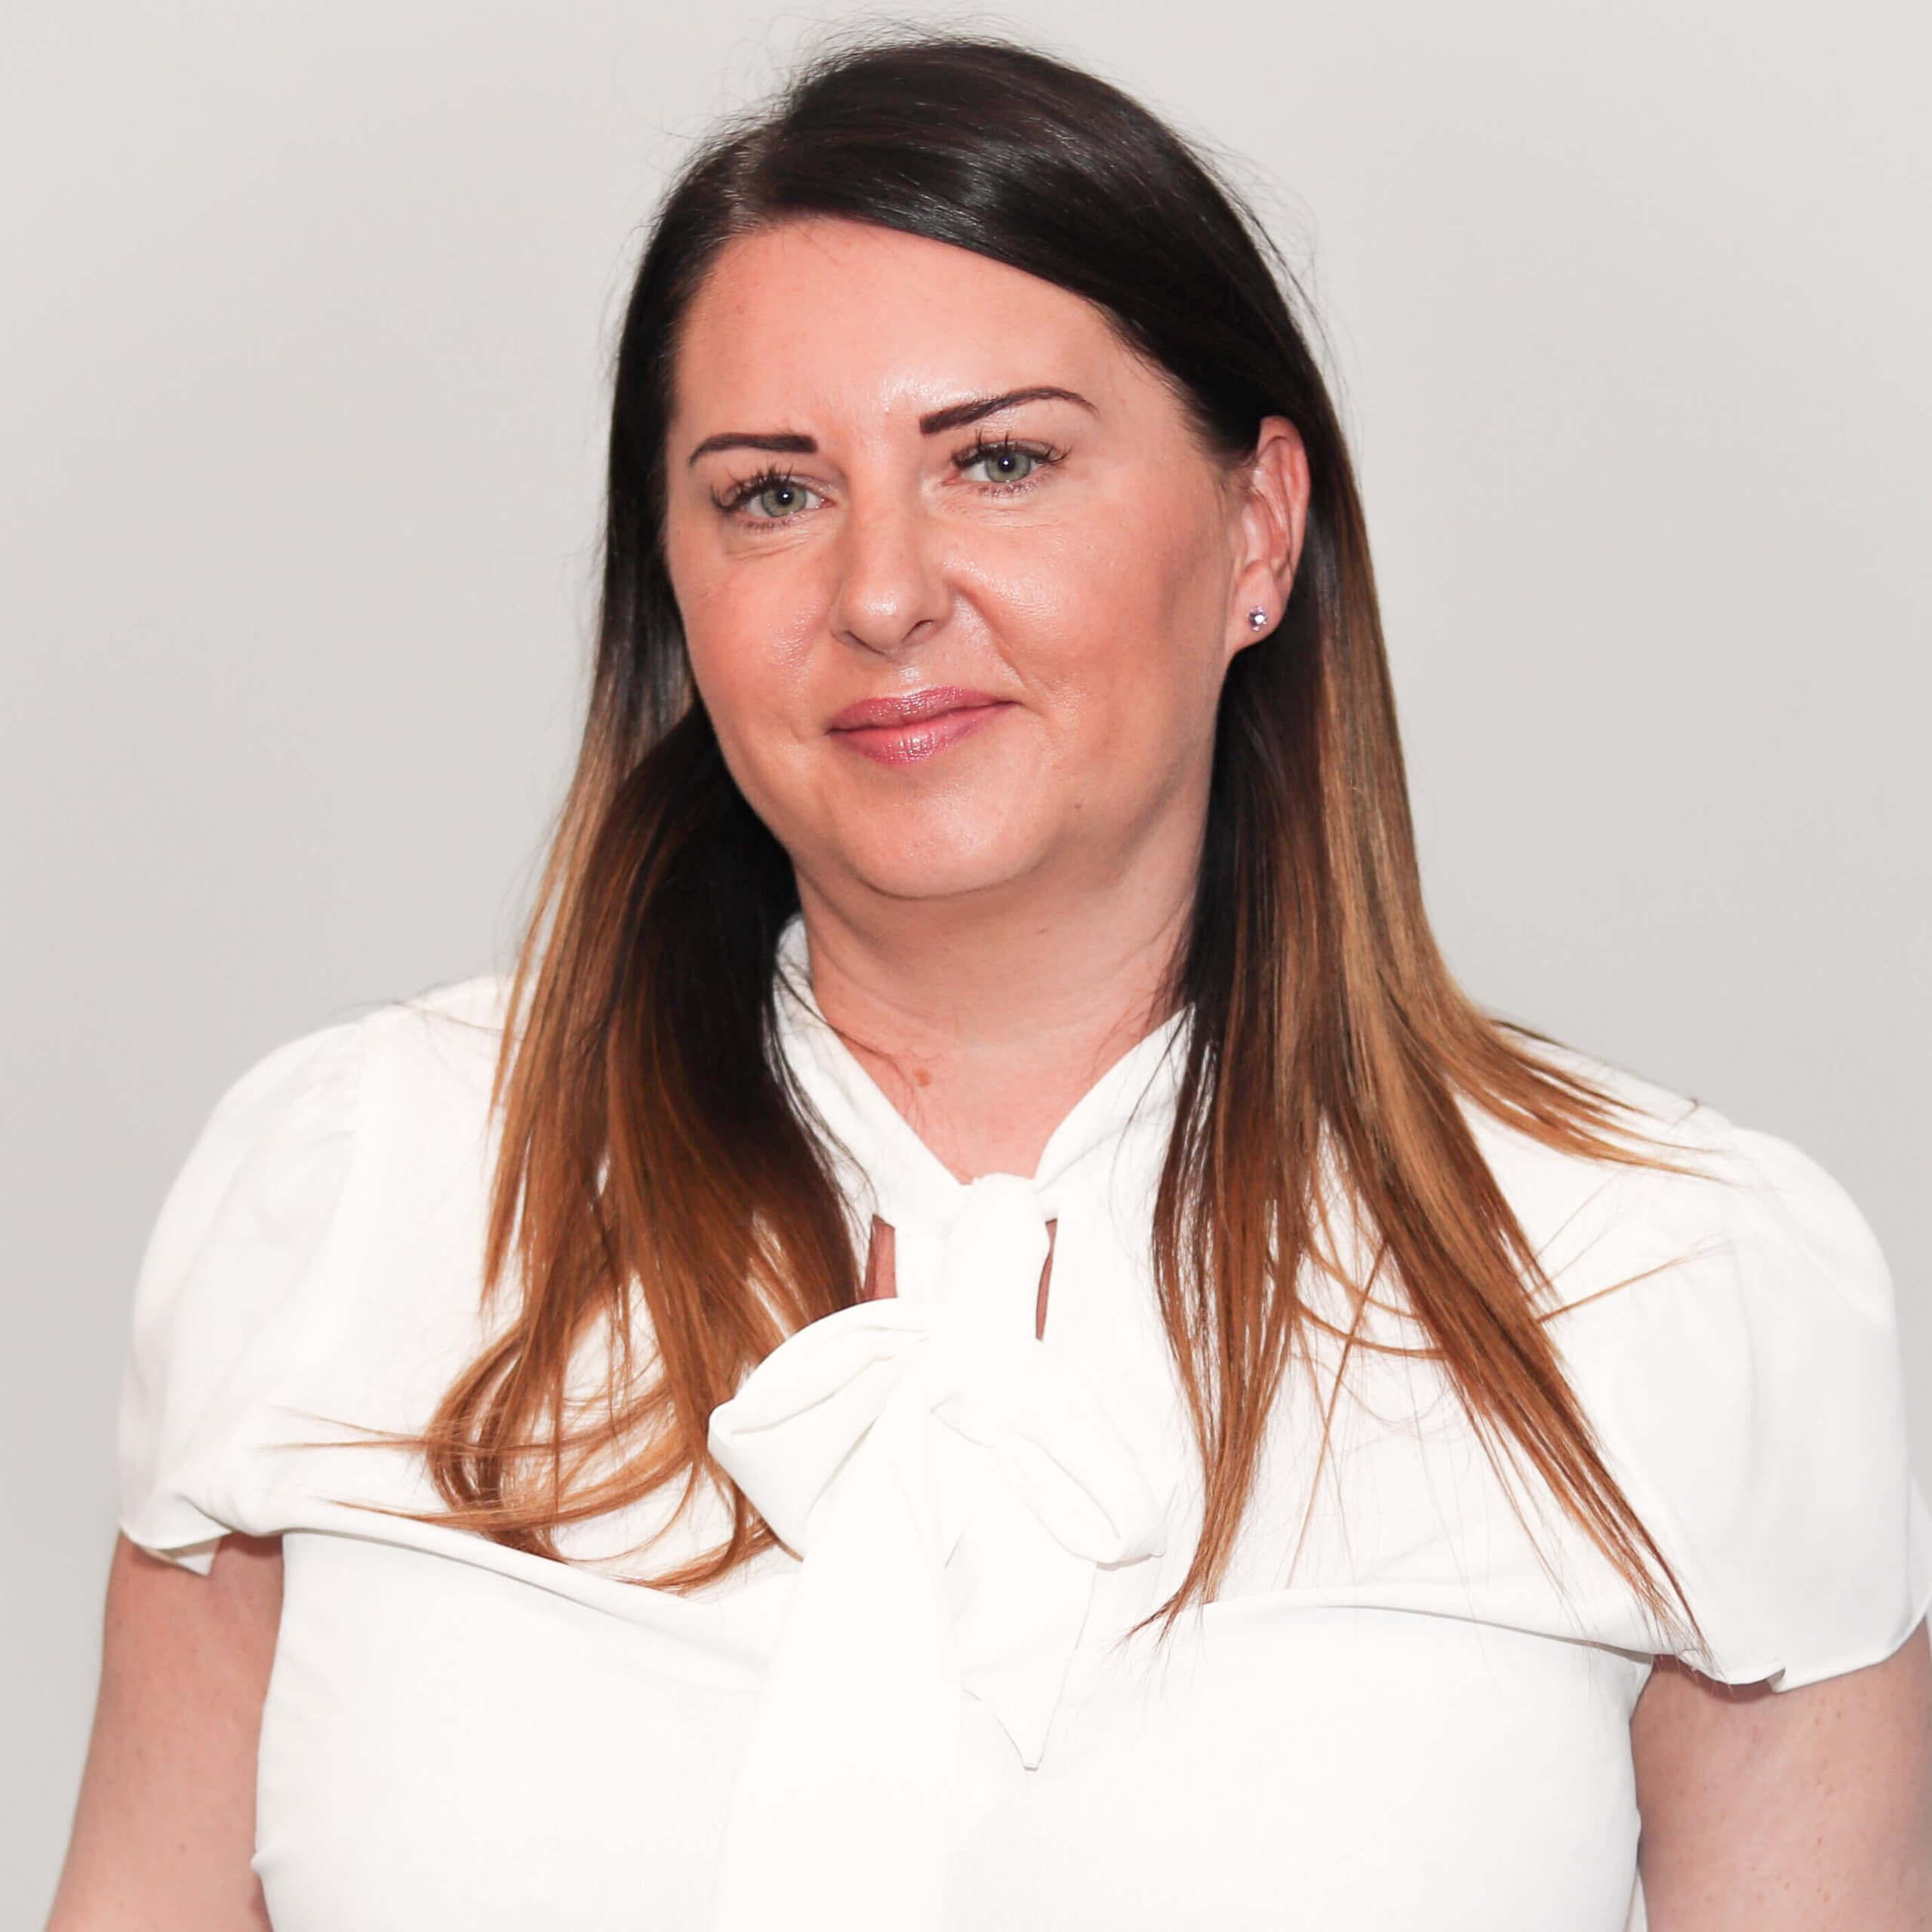 Staff - Marie Cheetham - AGM 2019